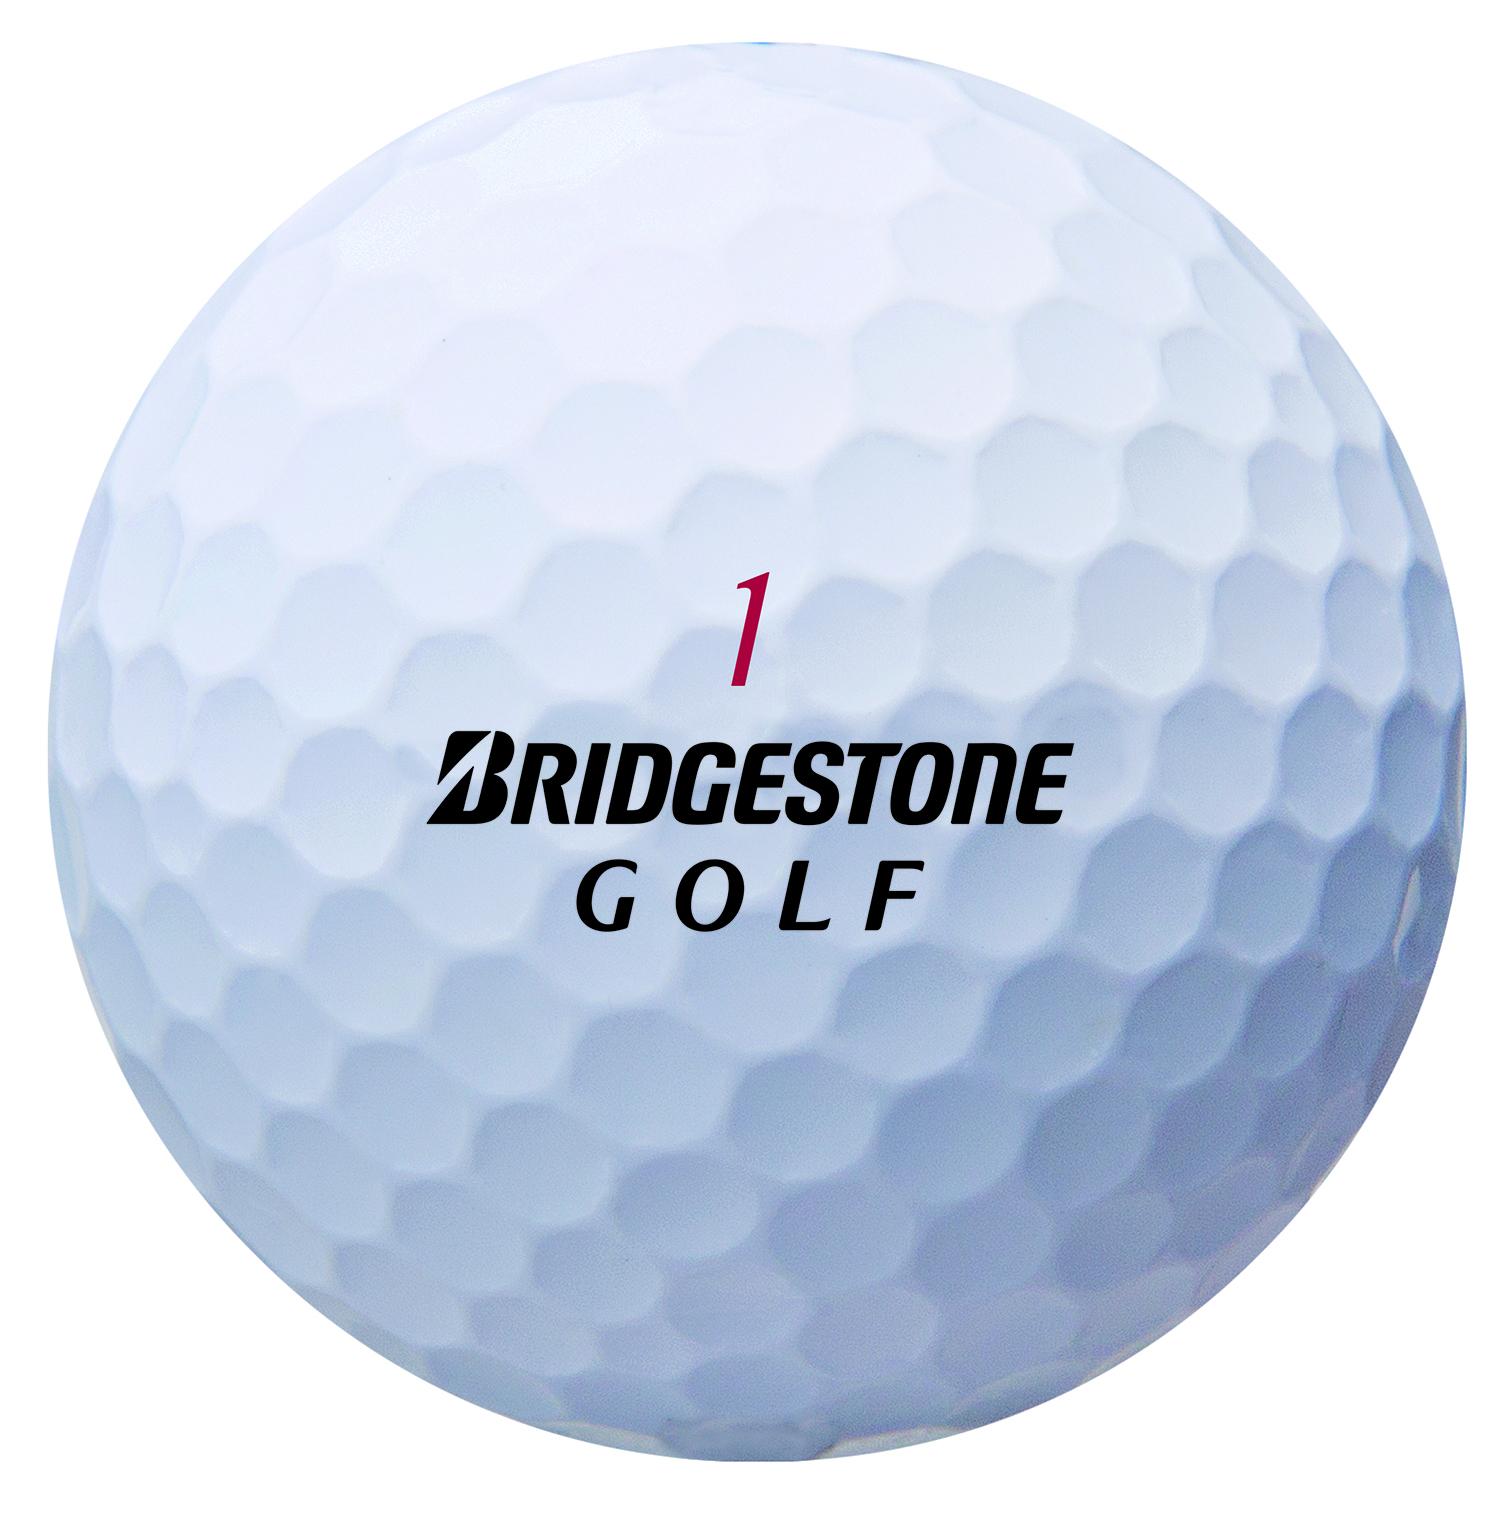 bridgestone e6 soft amp e6 speed golf balls first look